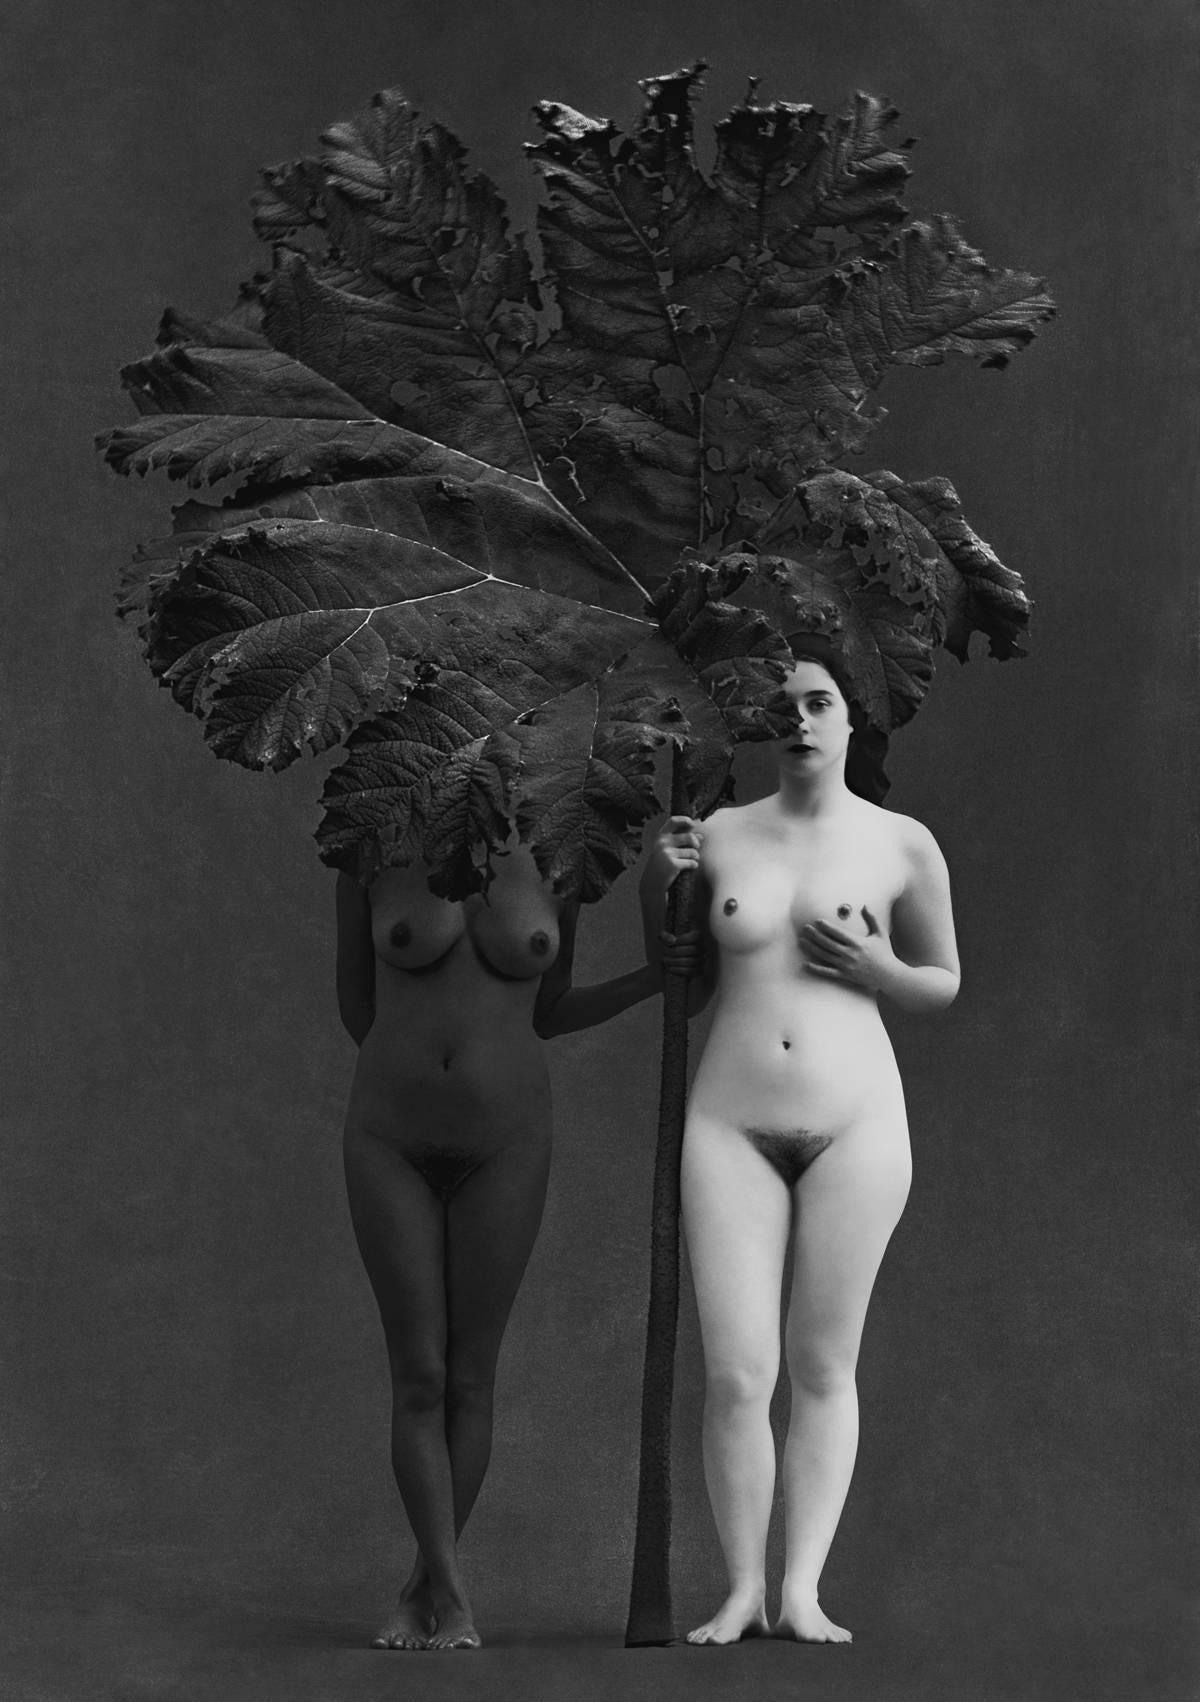 Edén, Switzerland, 2001 - Flor Garduño (Black and White Photography)